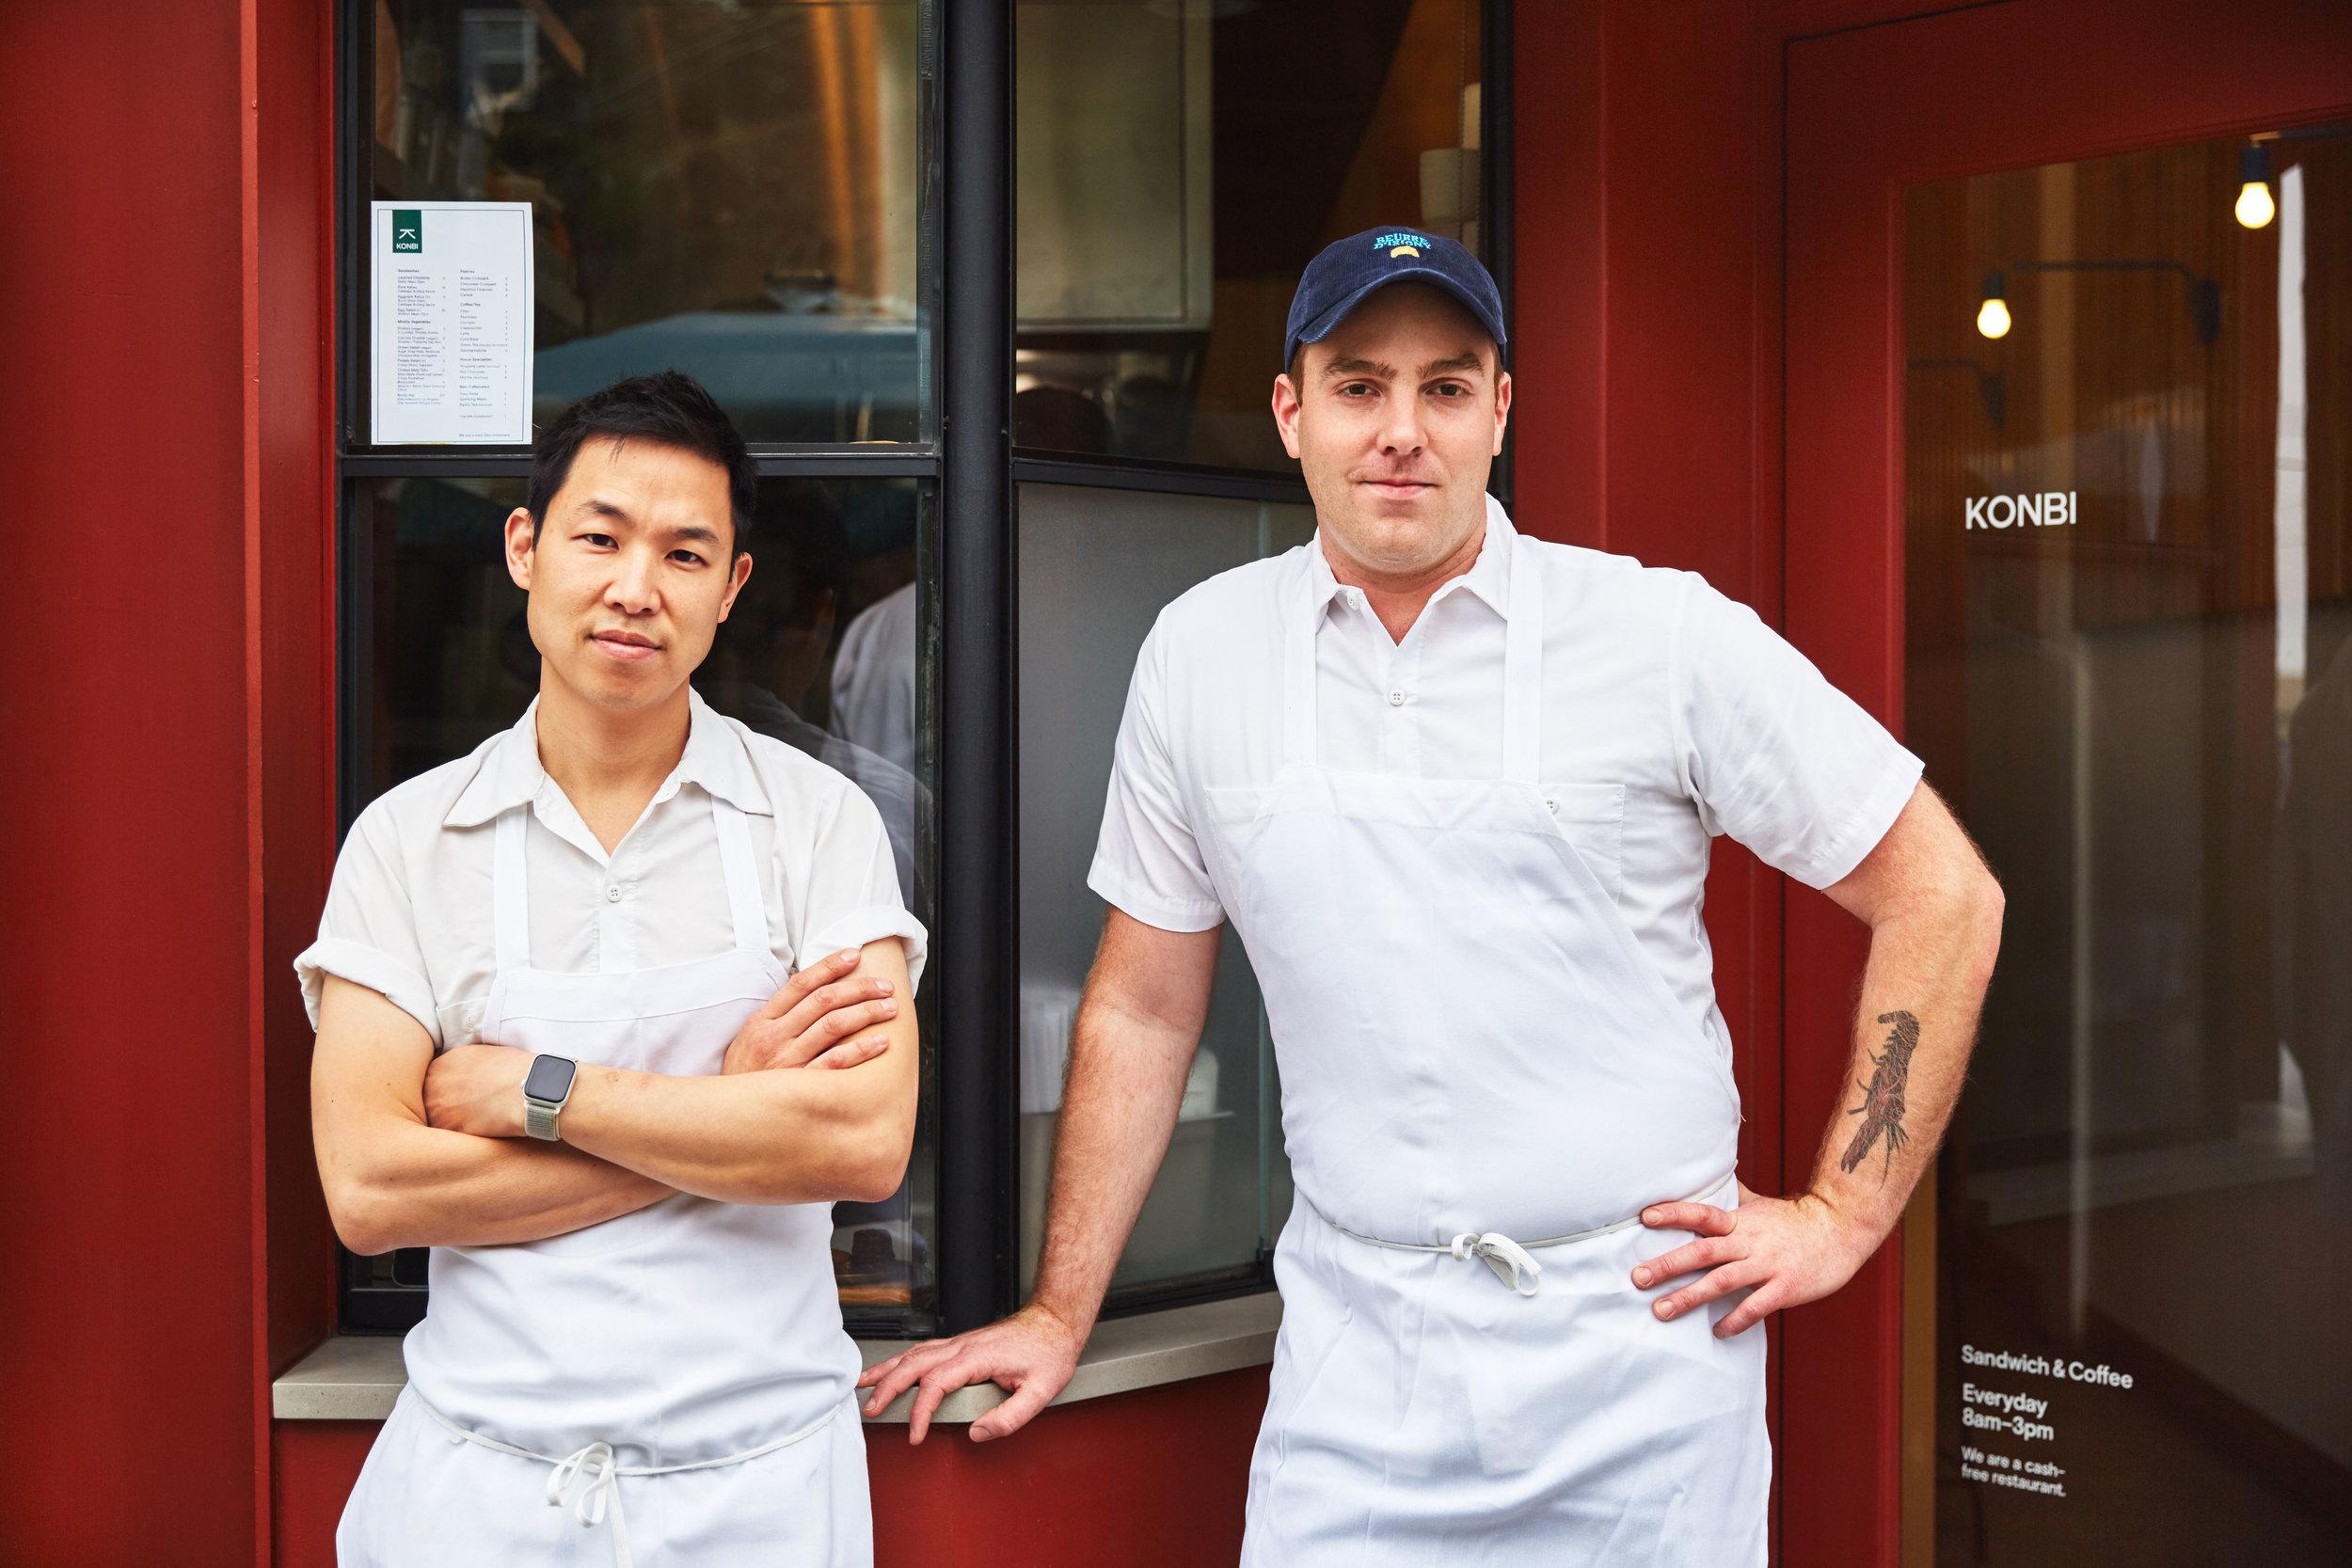 Chef/Owners - Akira Akuto and Nick Montgomery